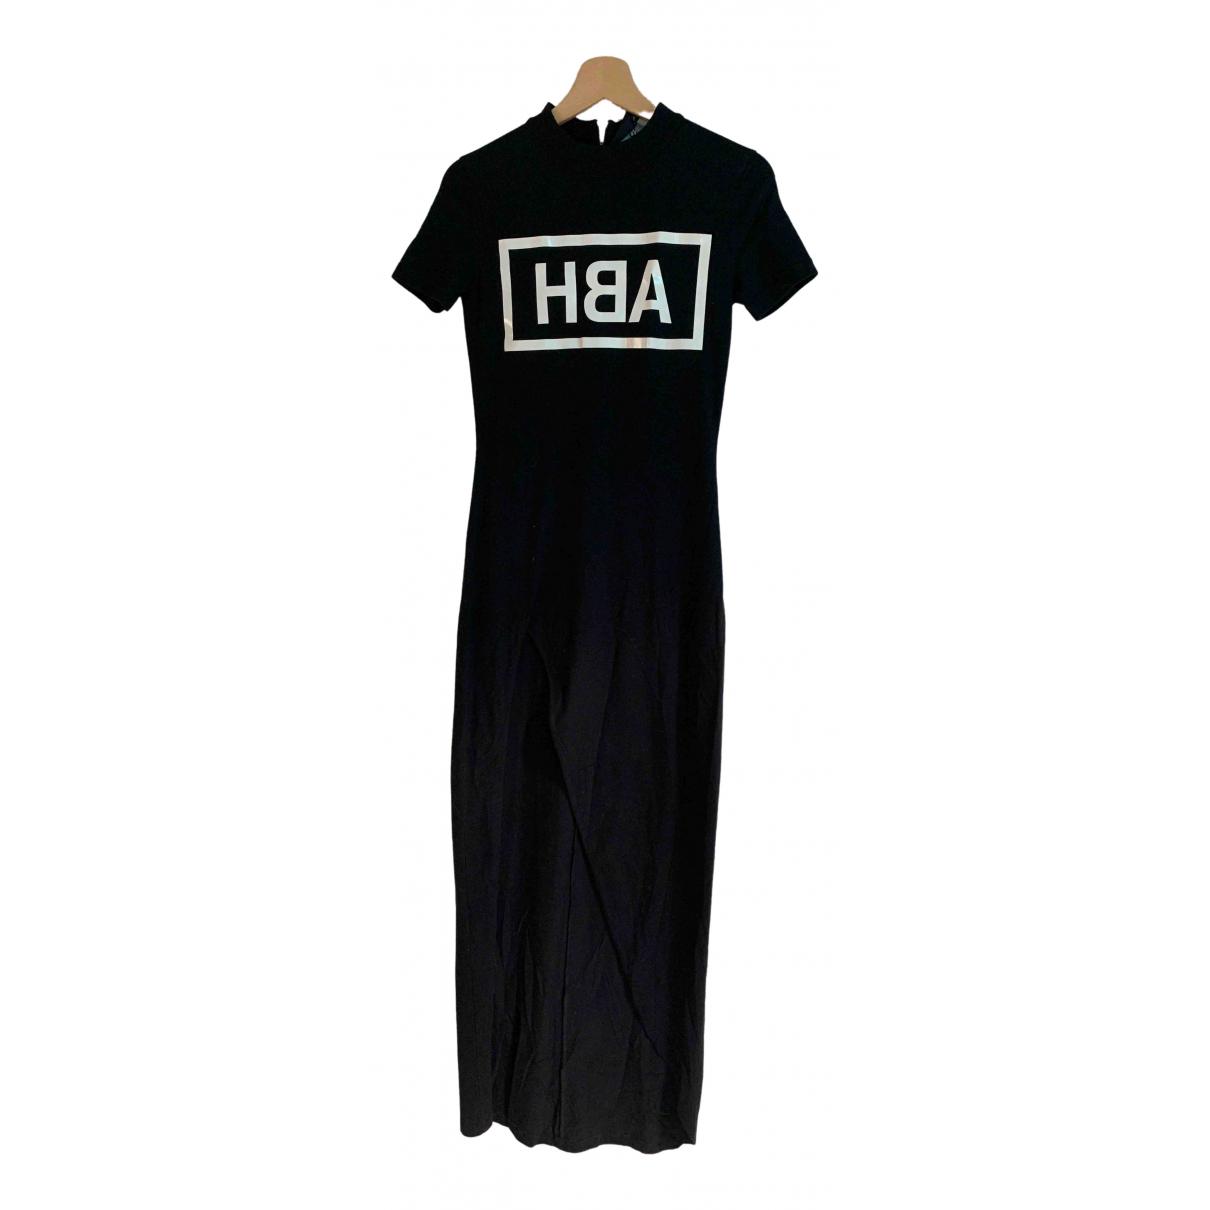 Hba \N Kleid in  Schwarz Baumwolle